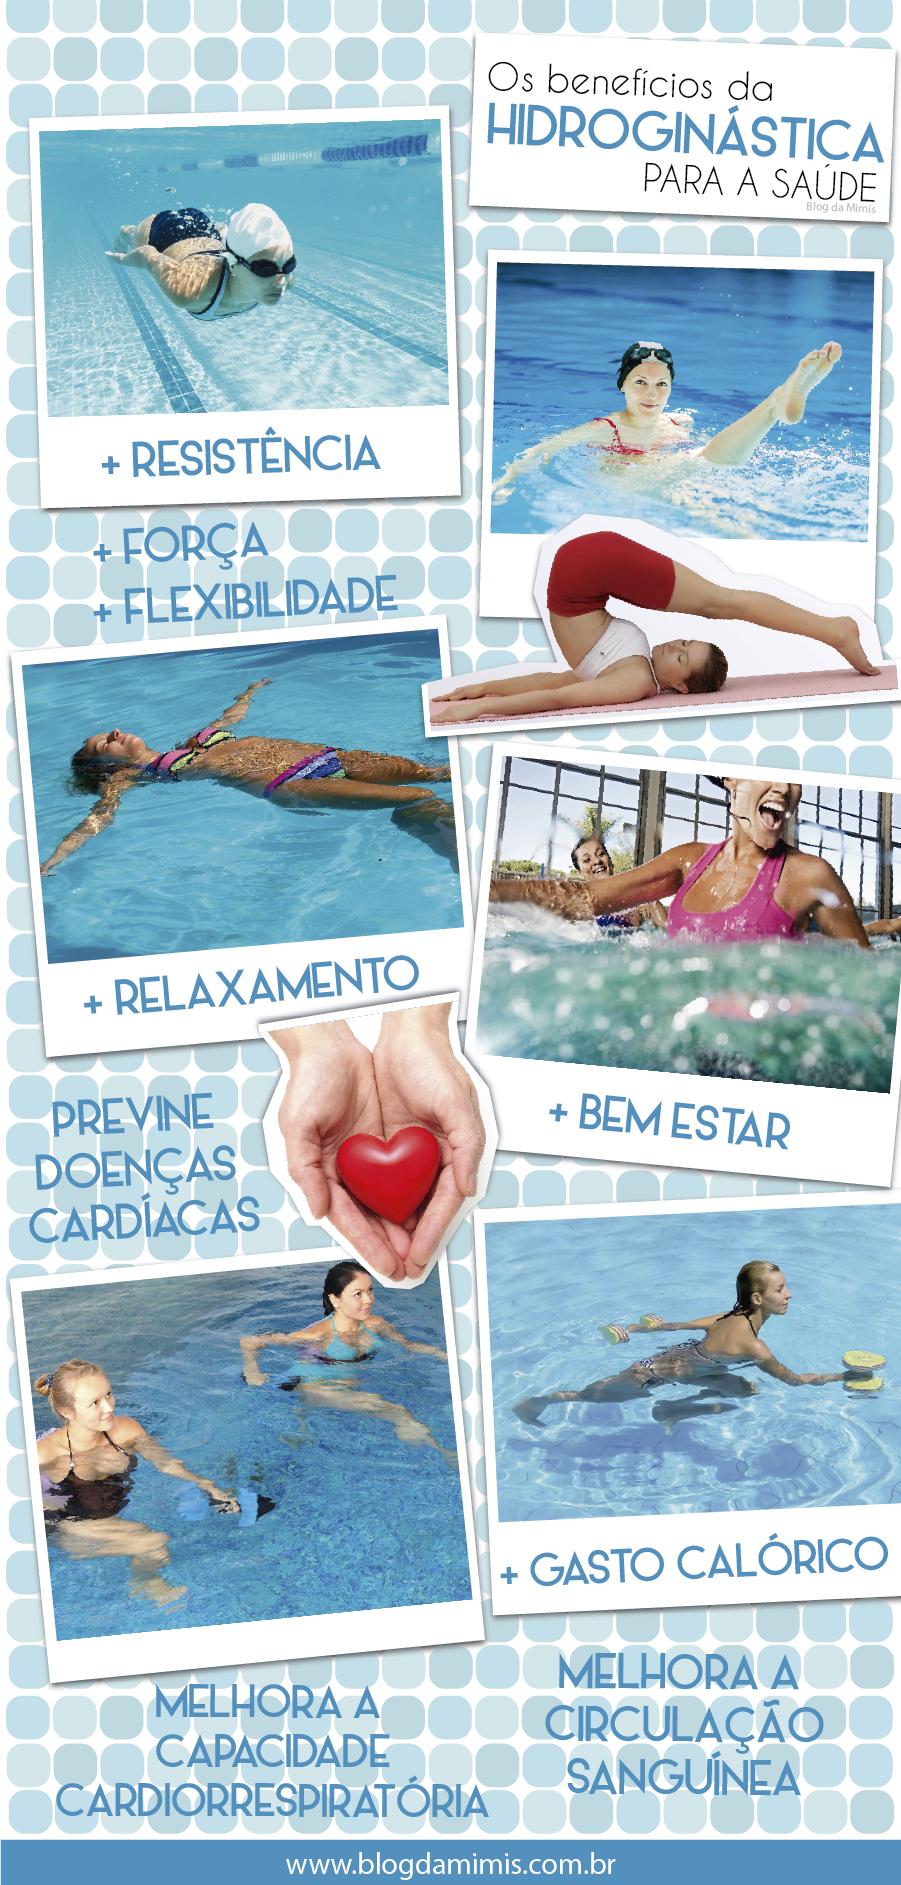 hidroginastica-blog-da-mimis-michelle-franzoni-11